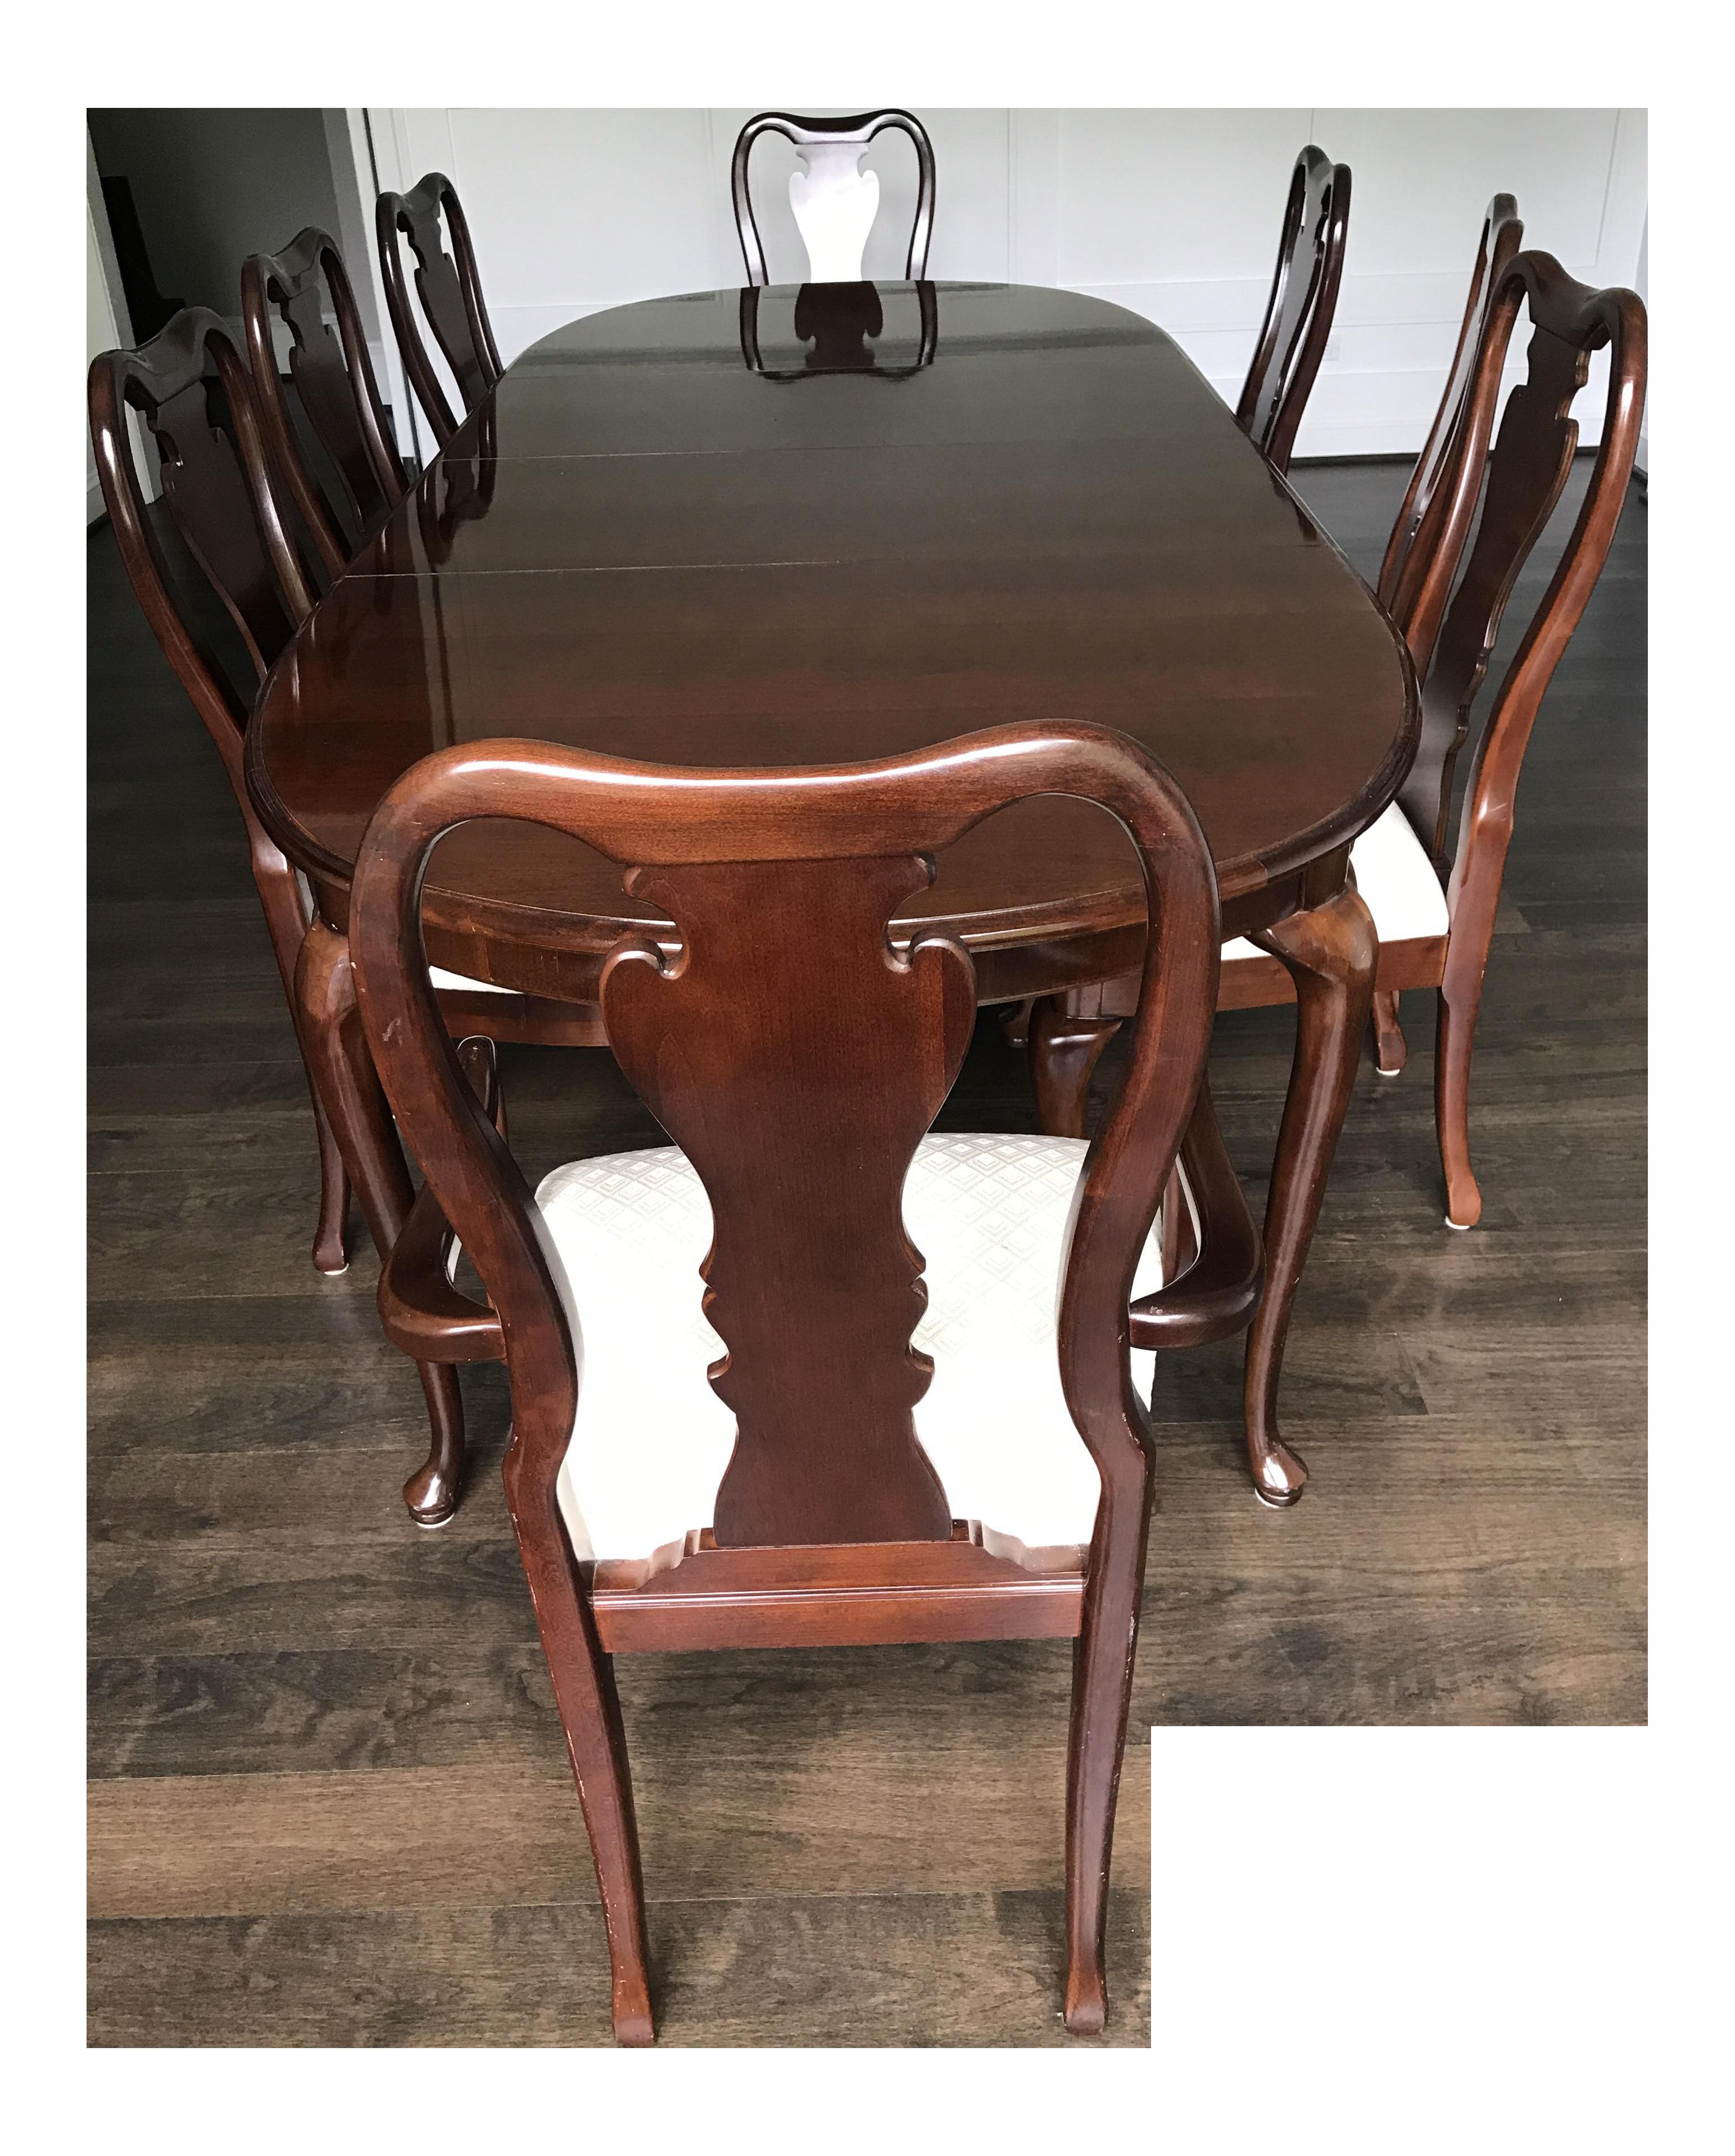 Thomasville Collector's Cherry Dining Set | Chairish